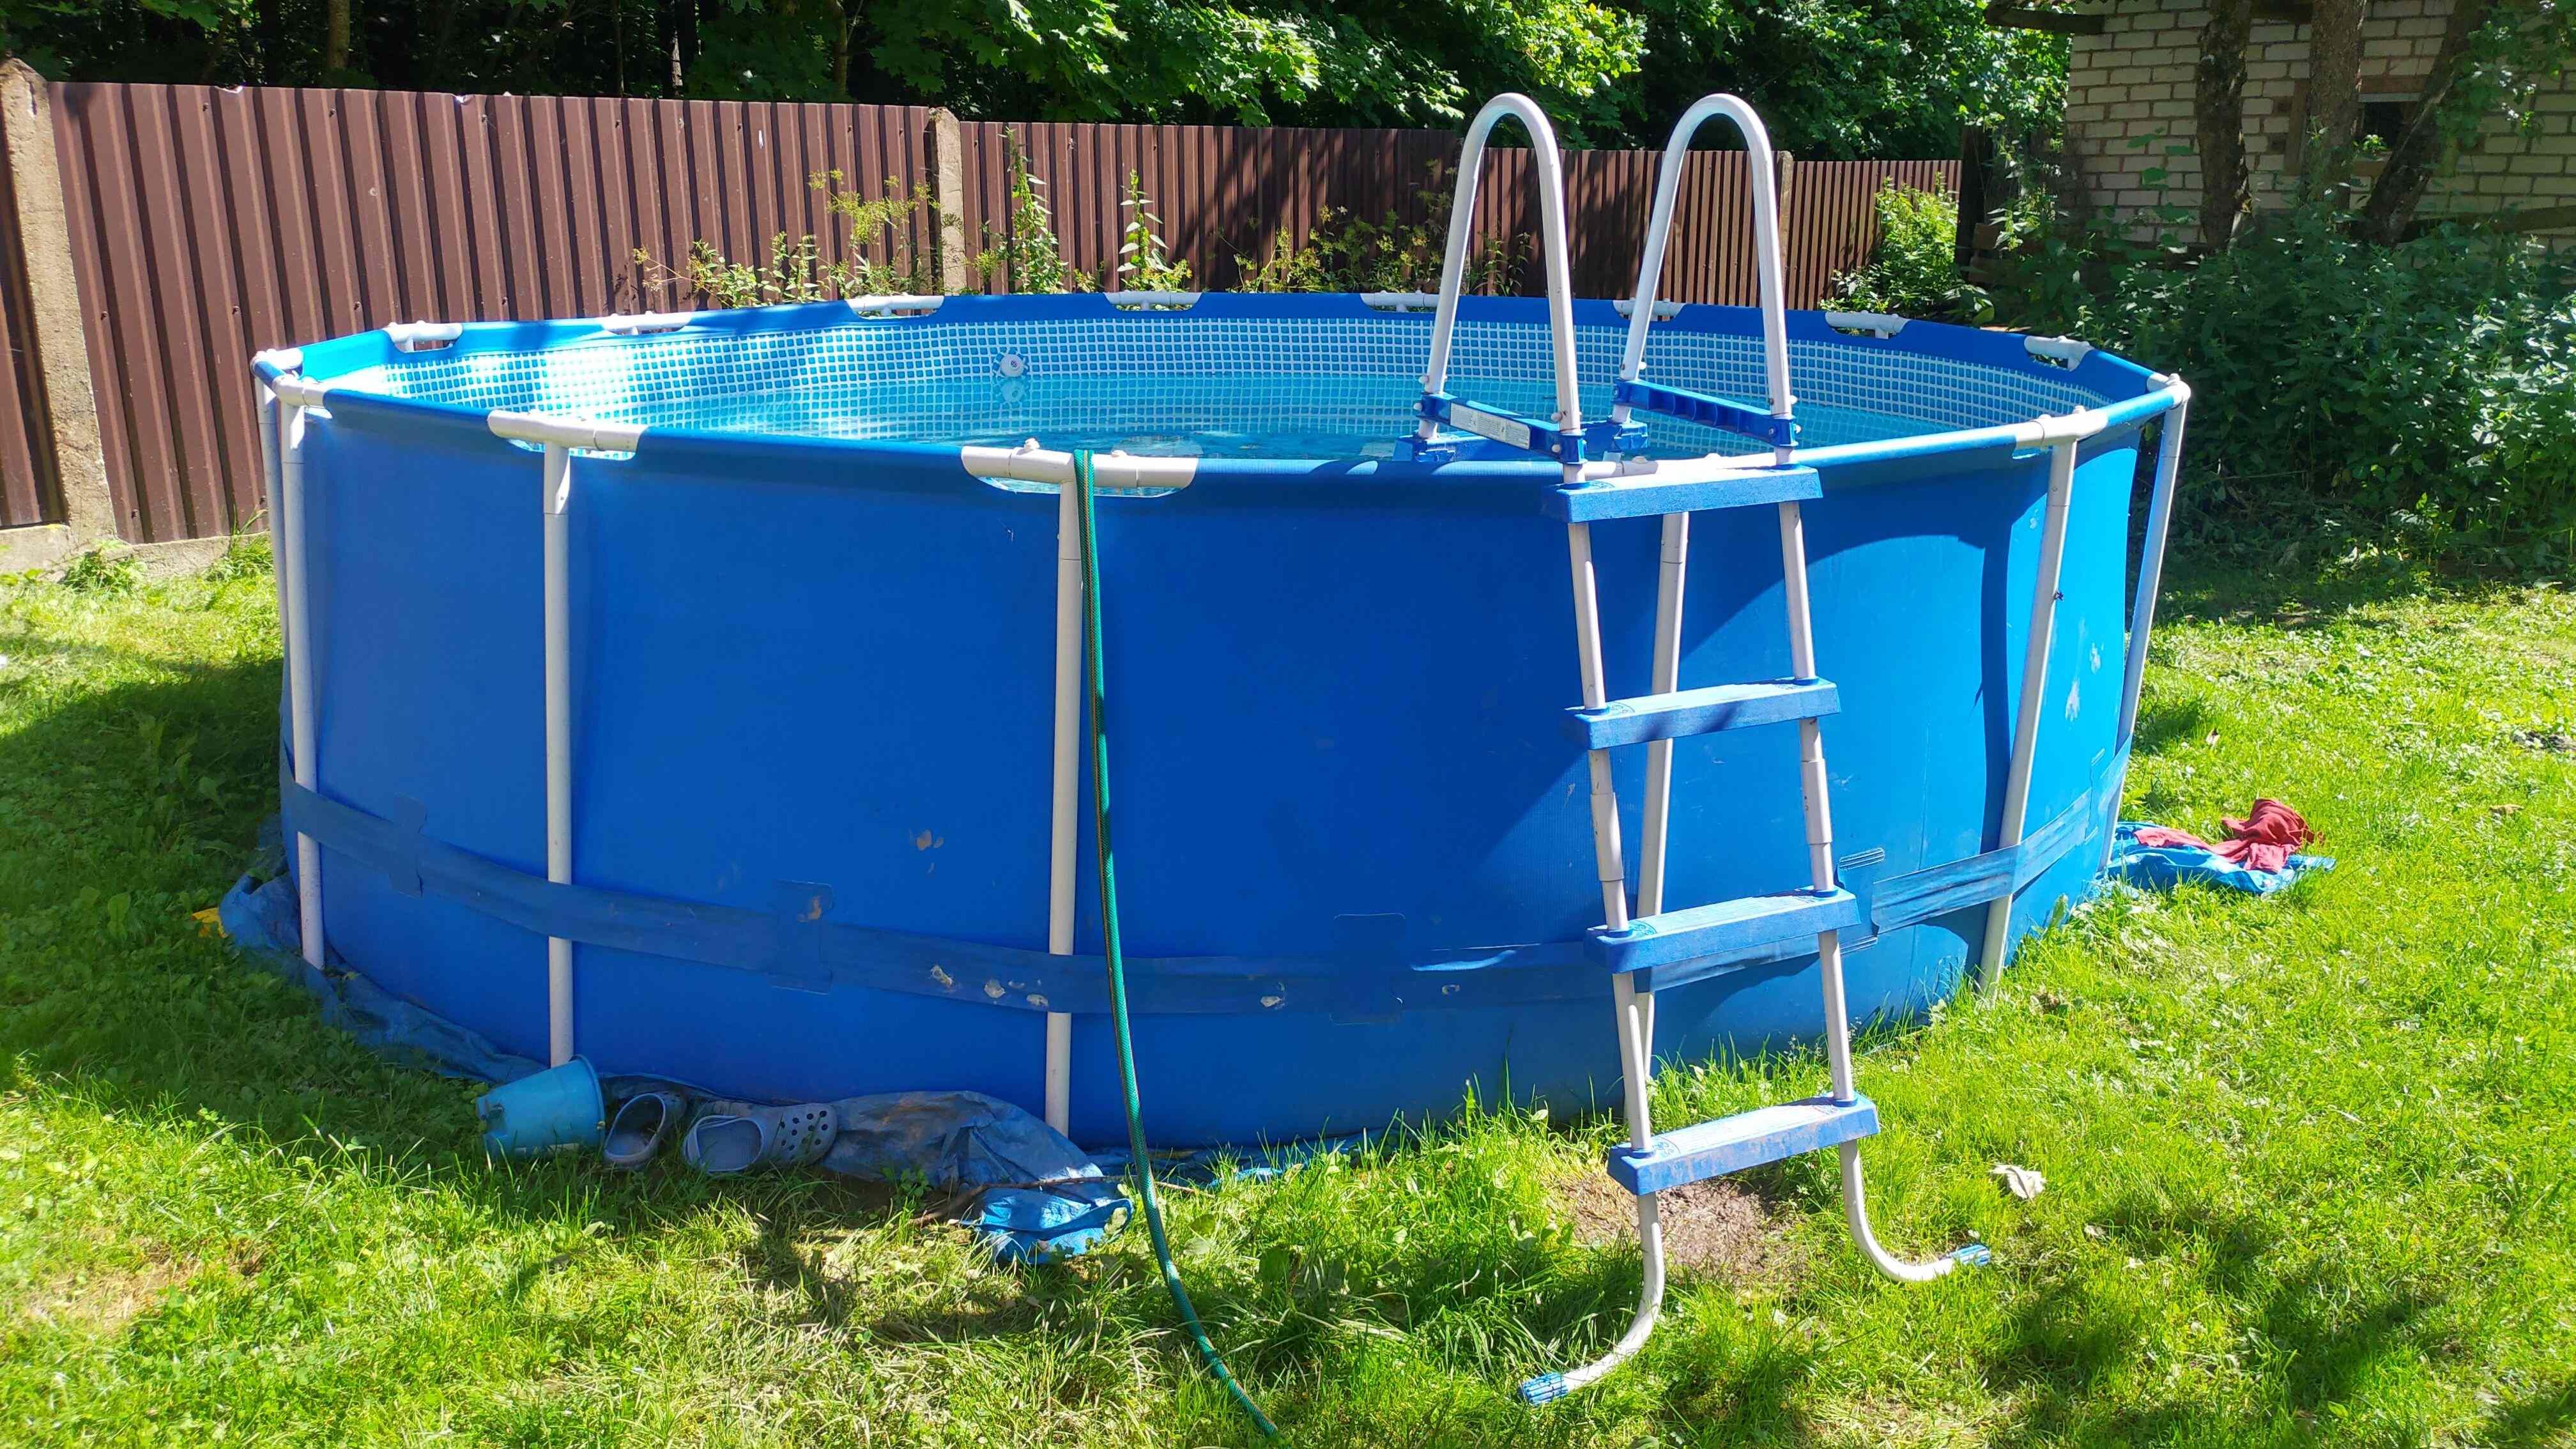 Frame-Pool aufbauen: So geht's